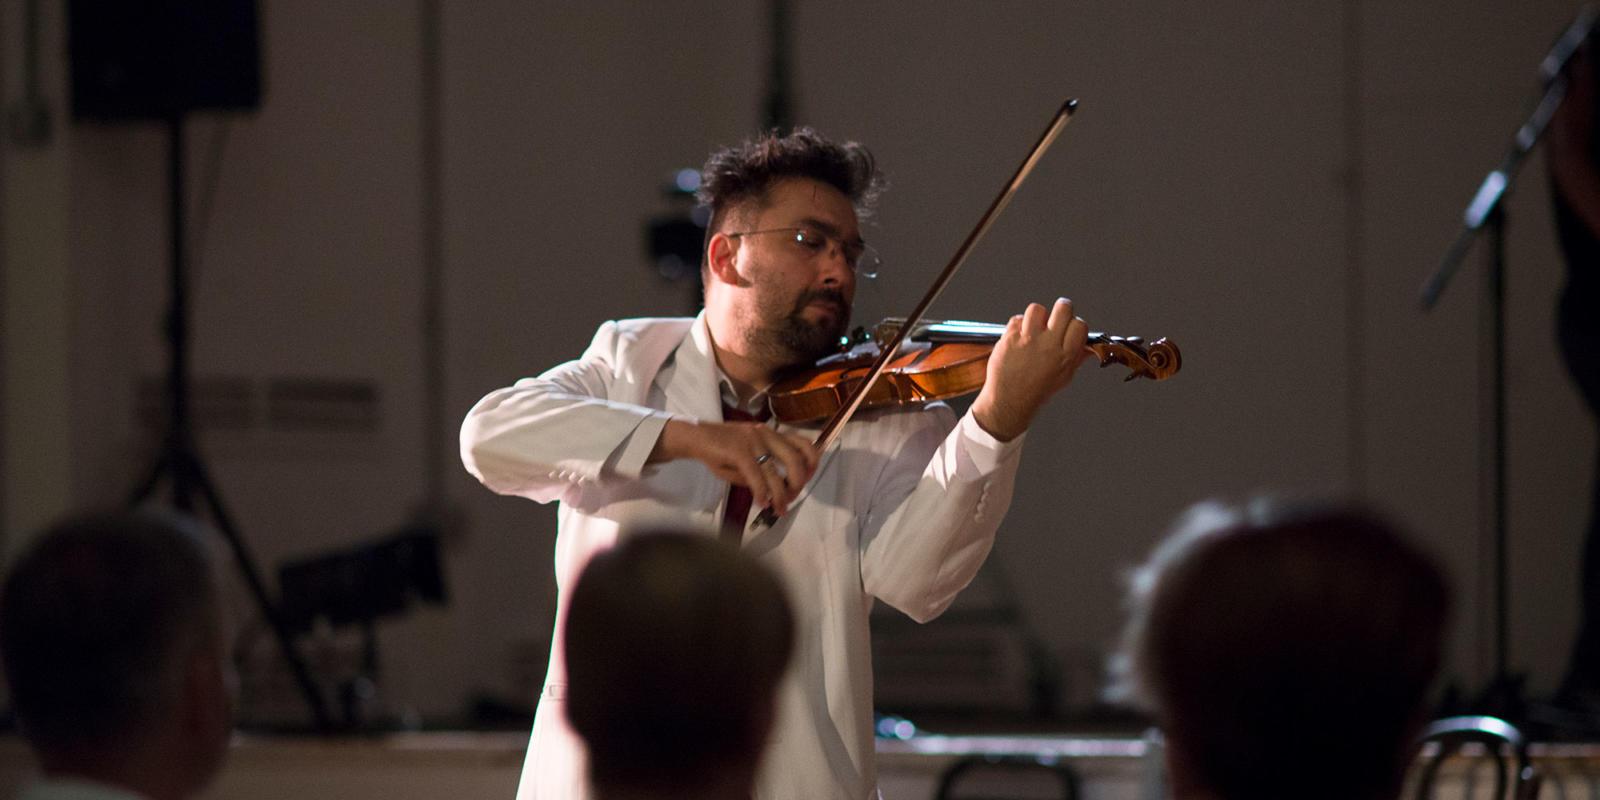 Tristesse Bogdan violinist Bogdan Vacarescu in ENO Youth Company final performance July 2018